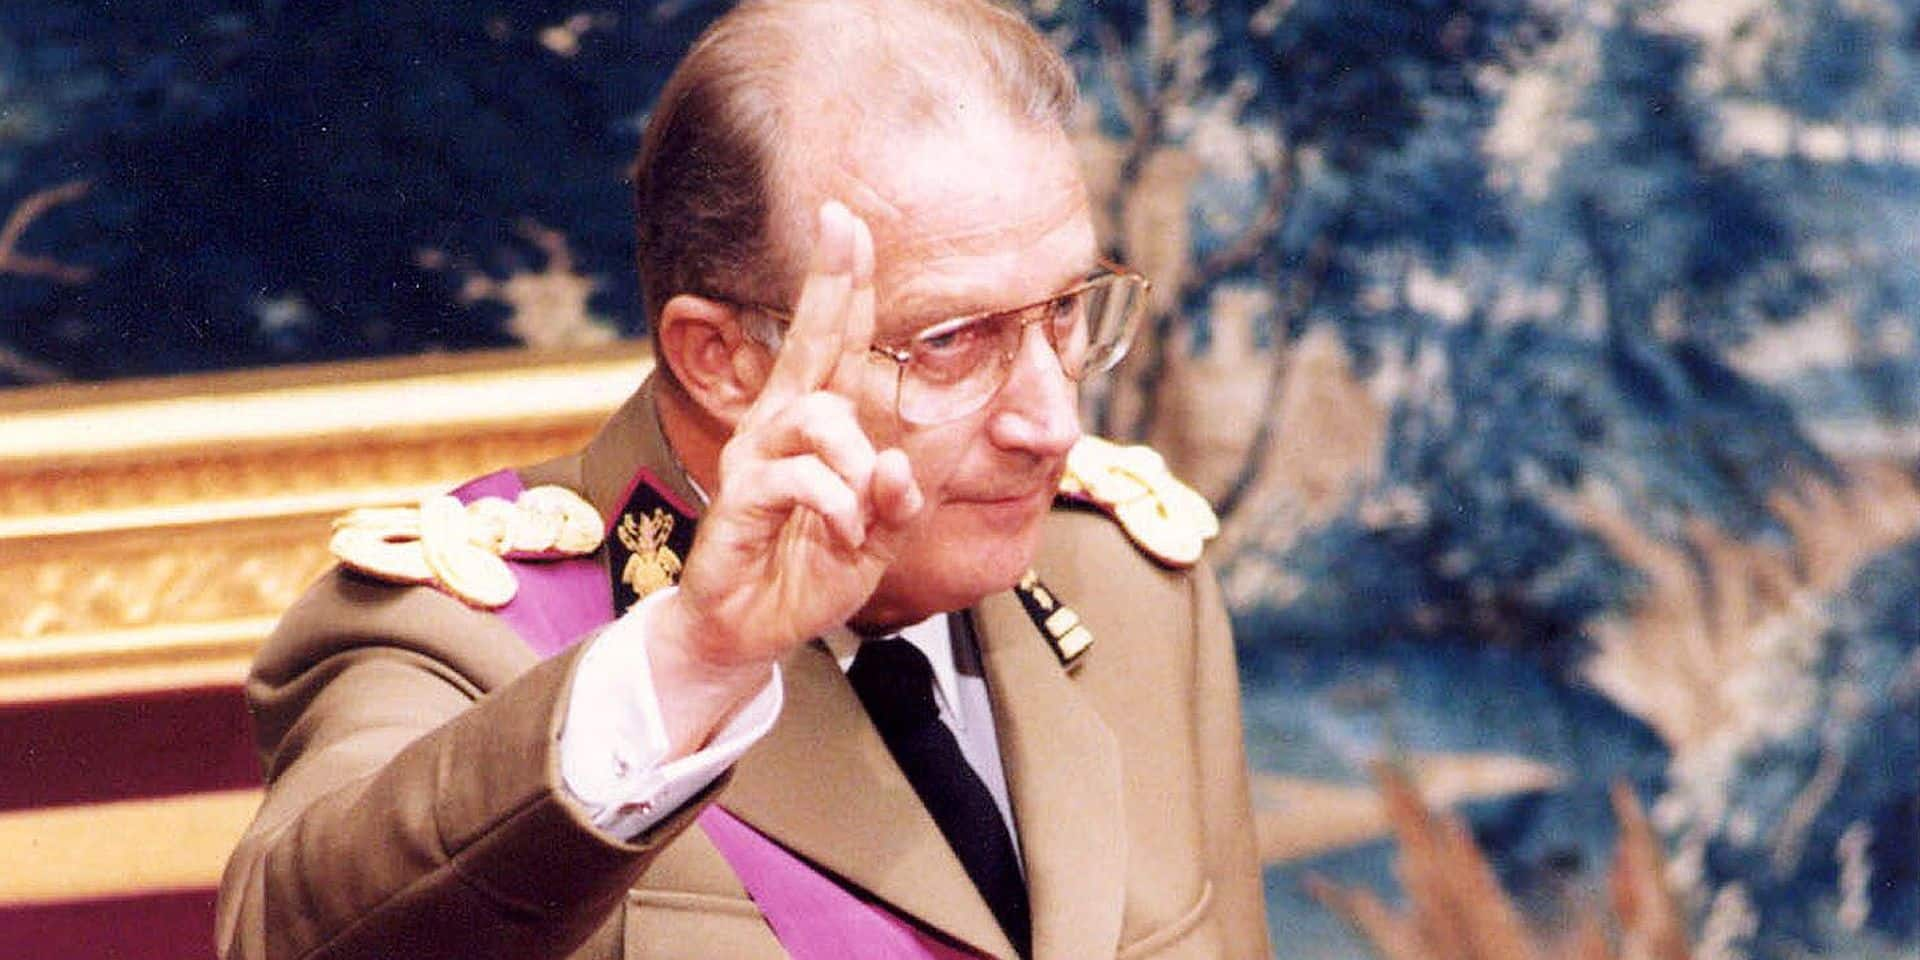 BRU30 - 19930809 - BRUSSELS, BELGIUM : BELGIAN PRINCE ALBERT TAKES THE CONSTITUTIONAL OATH AS NEW KING , ALBERT II OF THE BELGIAN PEOPLE BEFORE THE ASSEMBLED PARLIAMENT , 09 AUGUST 1993../.VD BELGA PHOTO